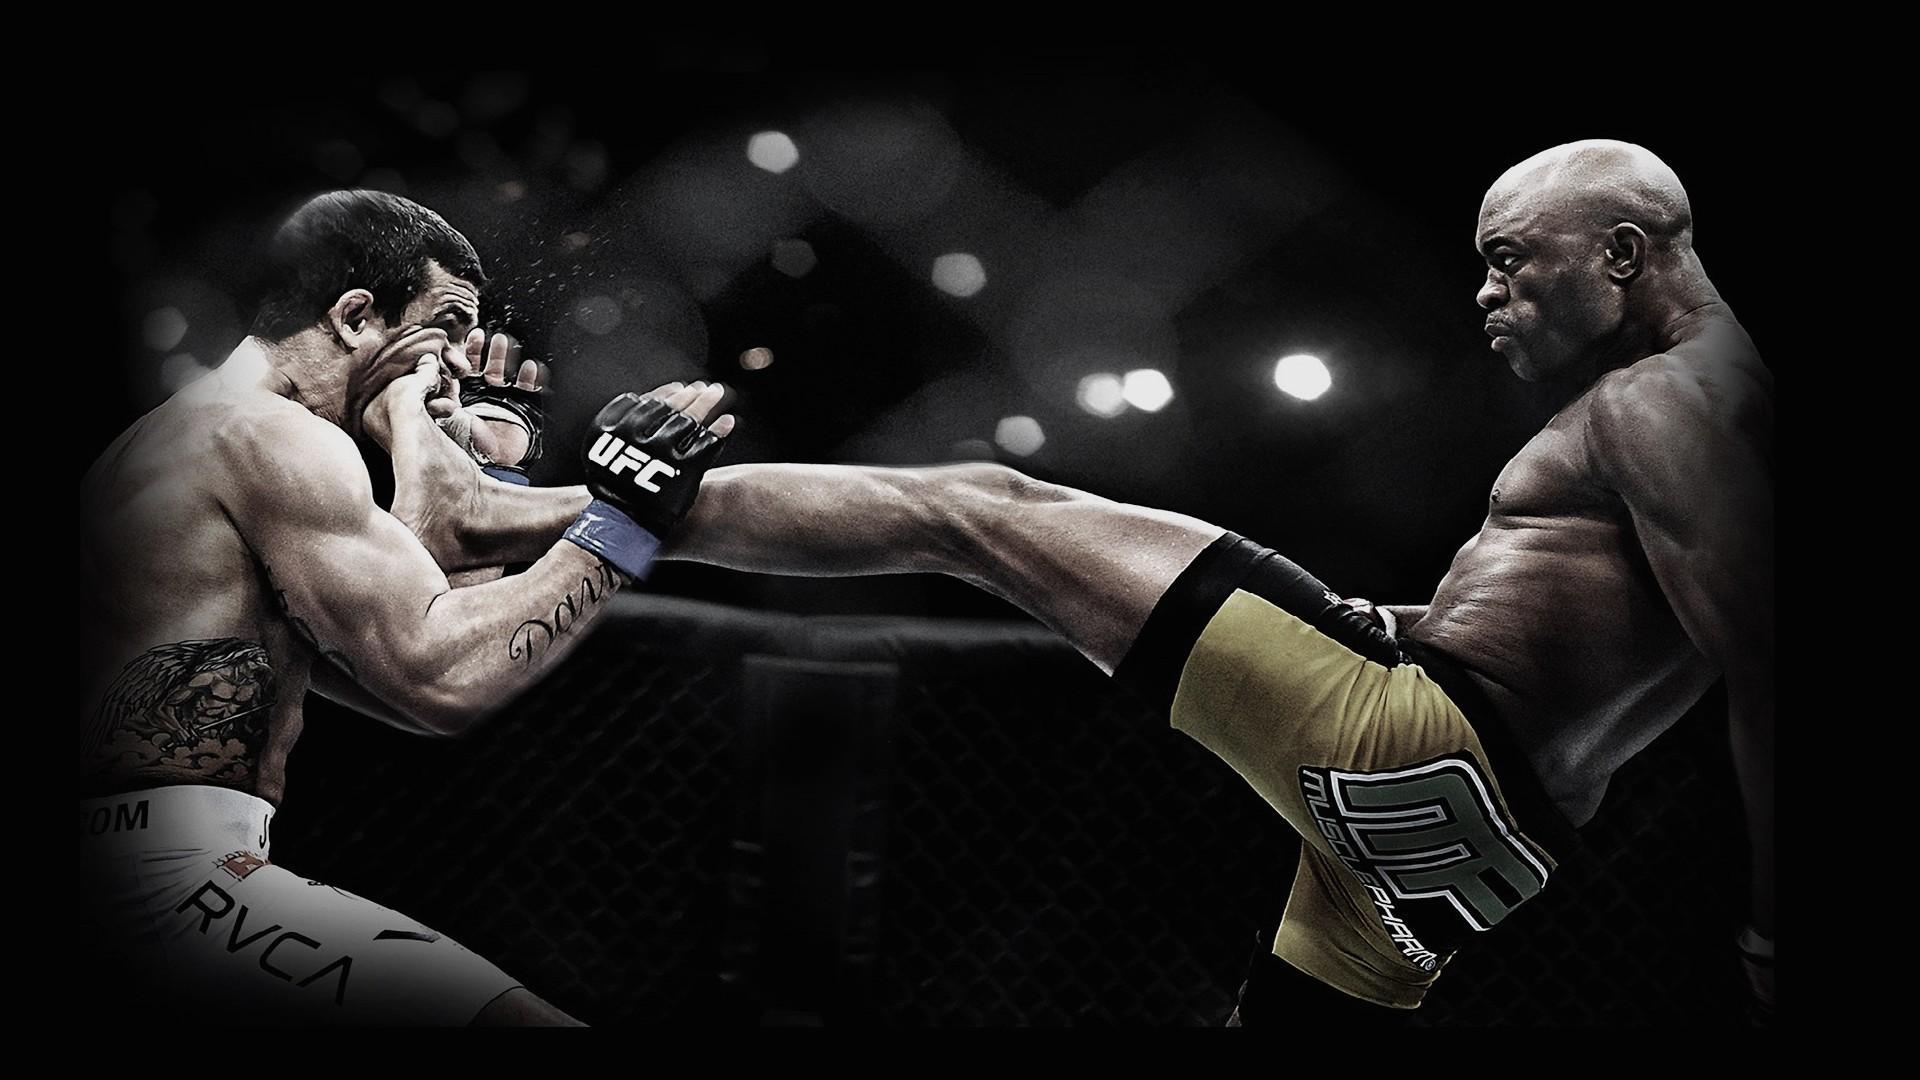 74] Kickboxing Wallpaper on WallpaperSafari 1920x1080